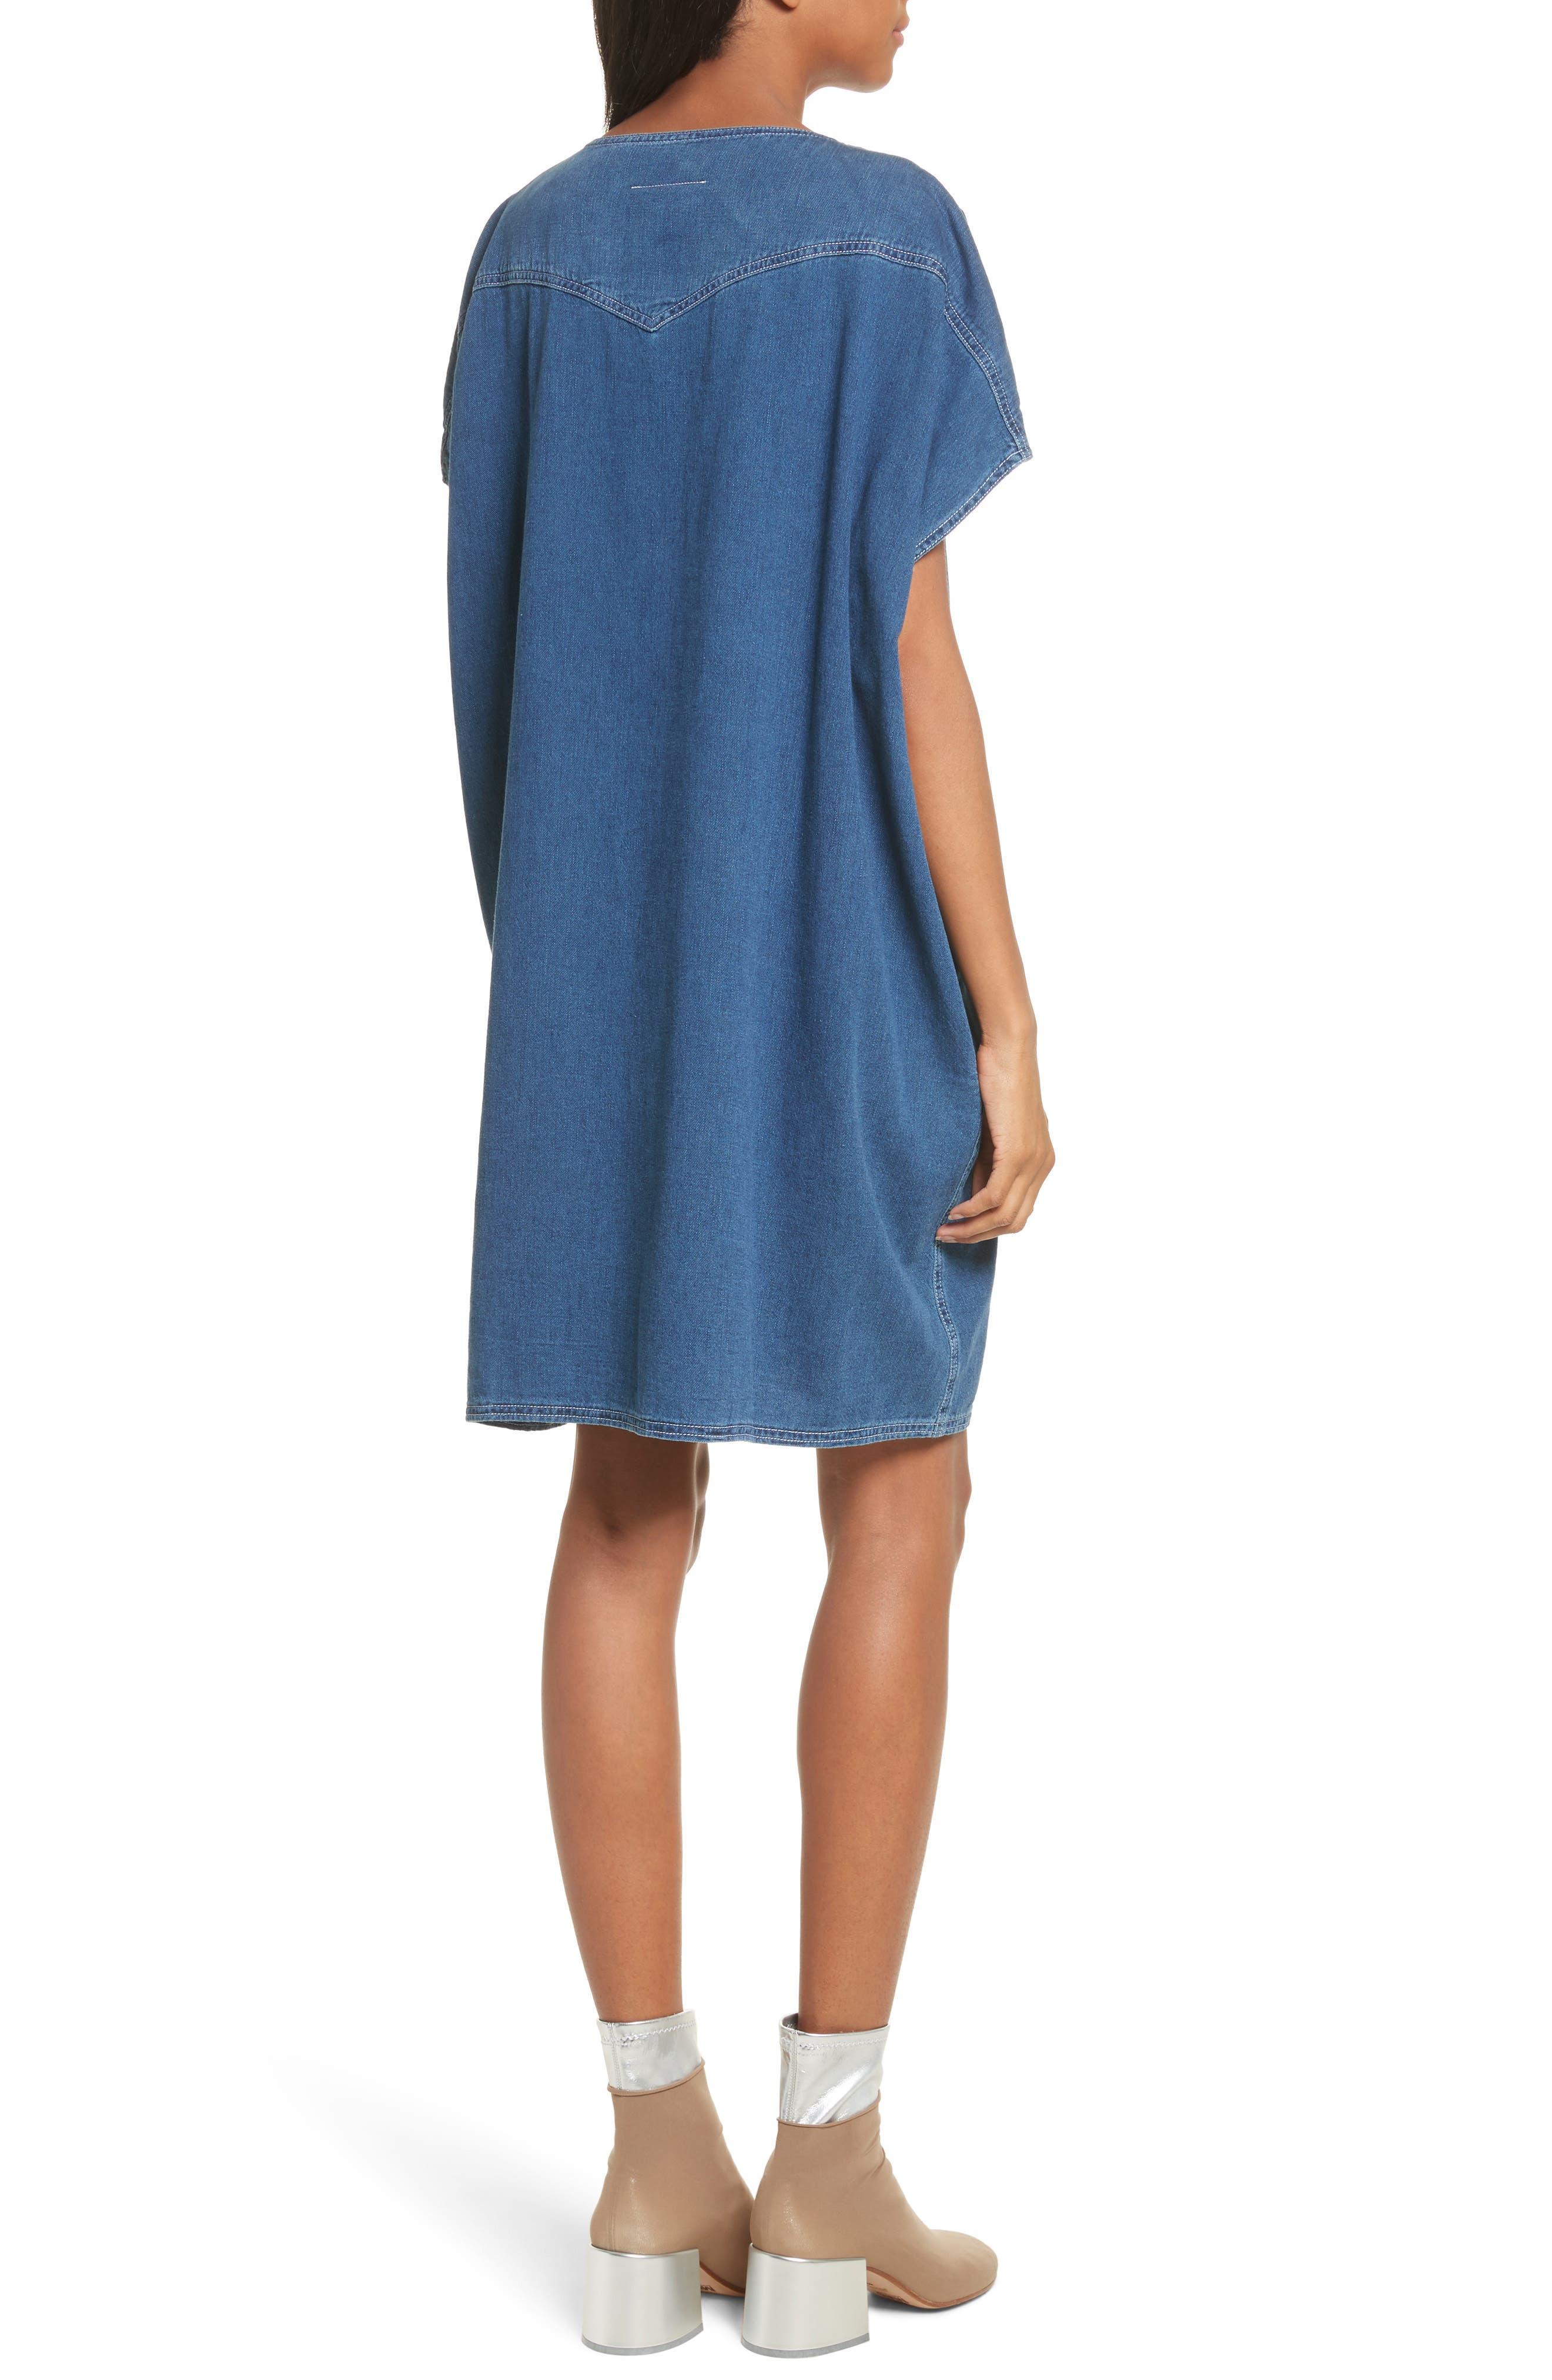 '80s Wash Denim Dress,                             Alternate thumbnail 2, color,                             400